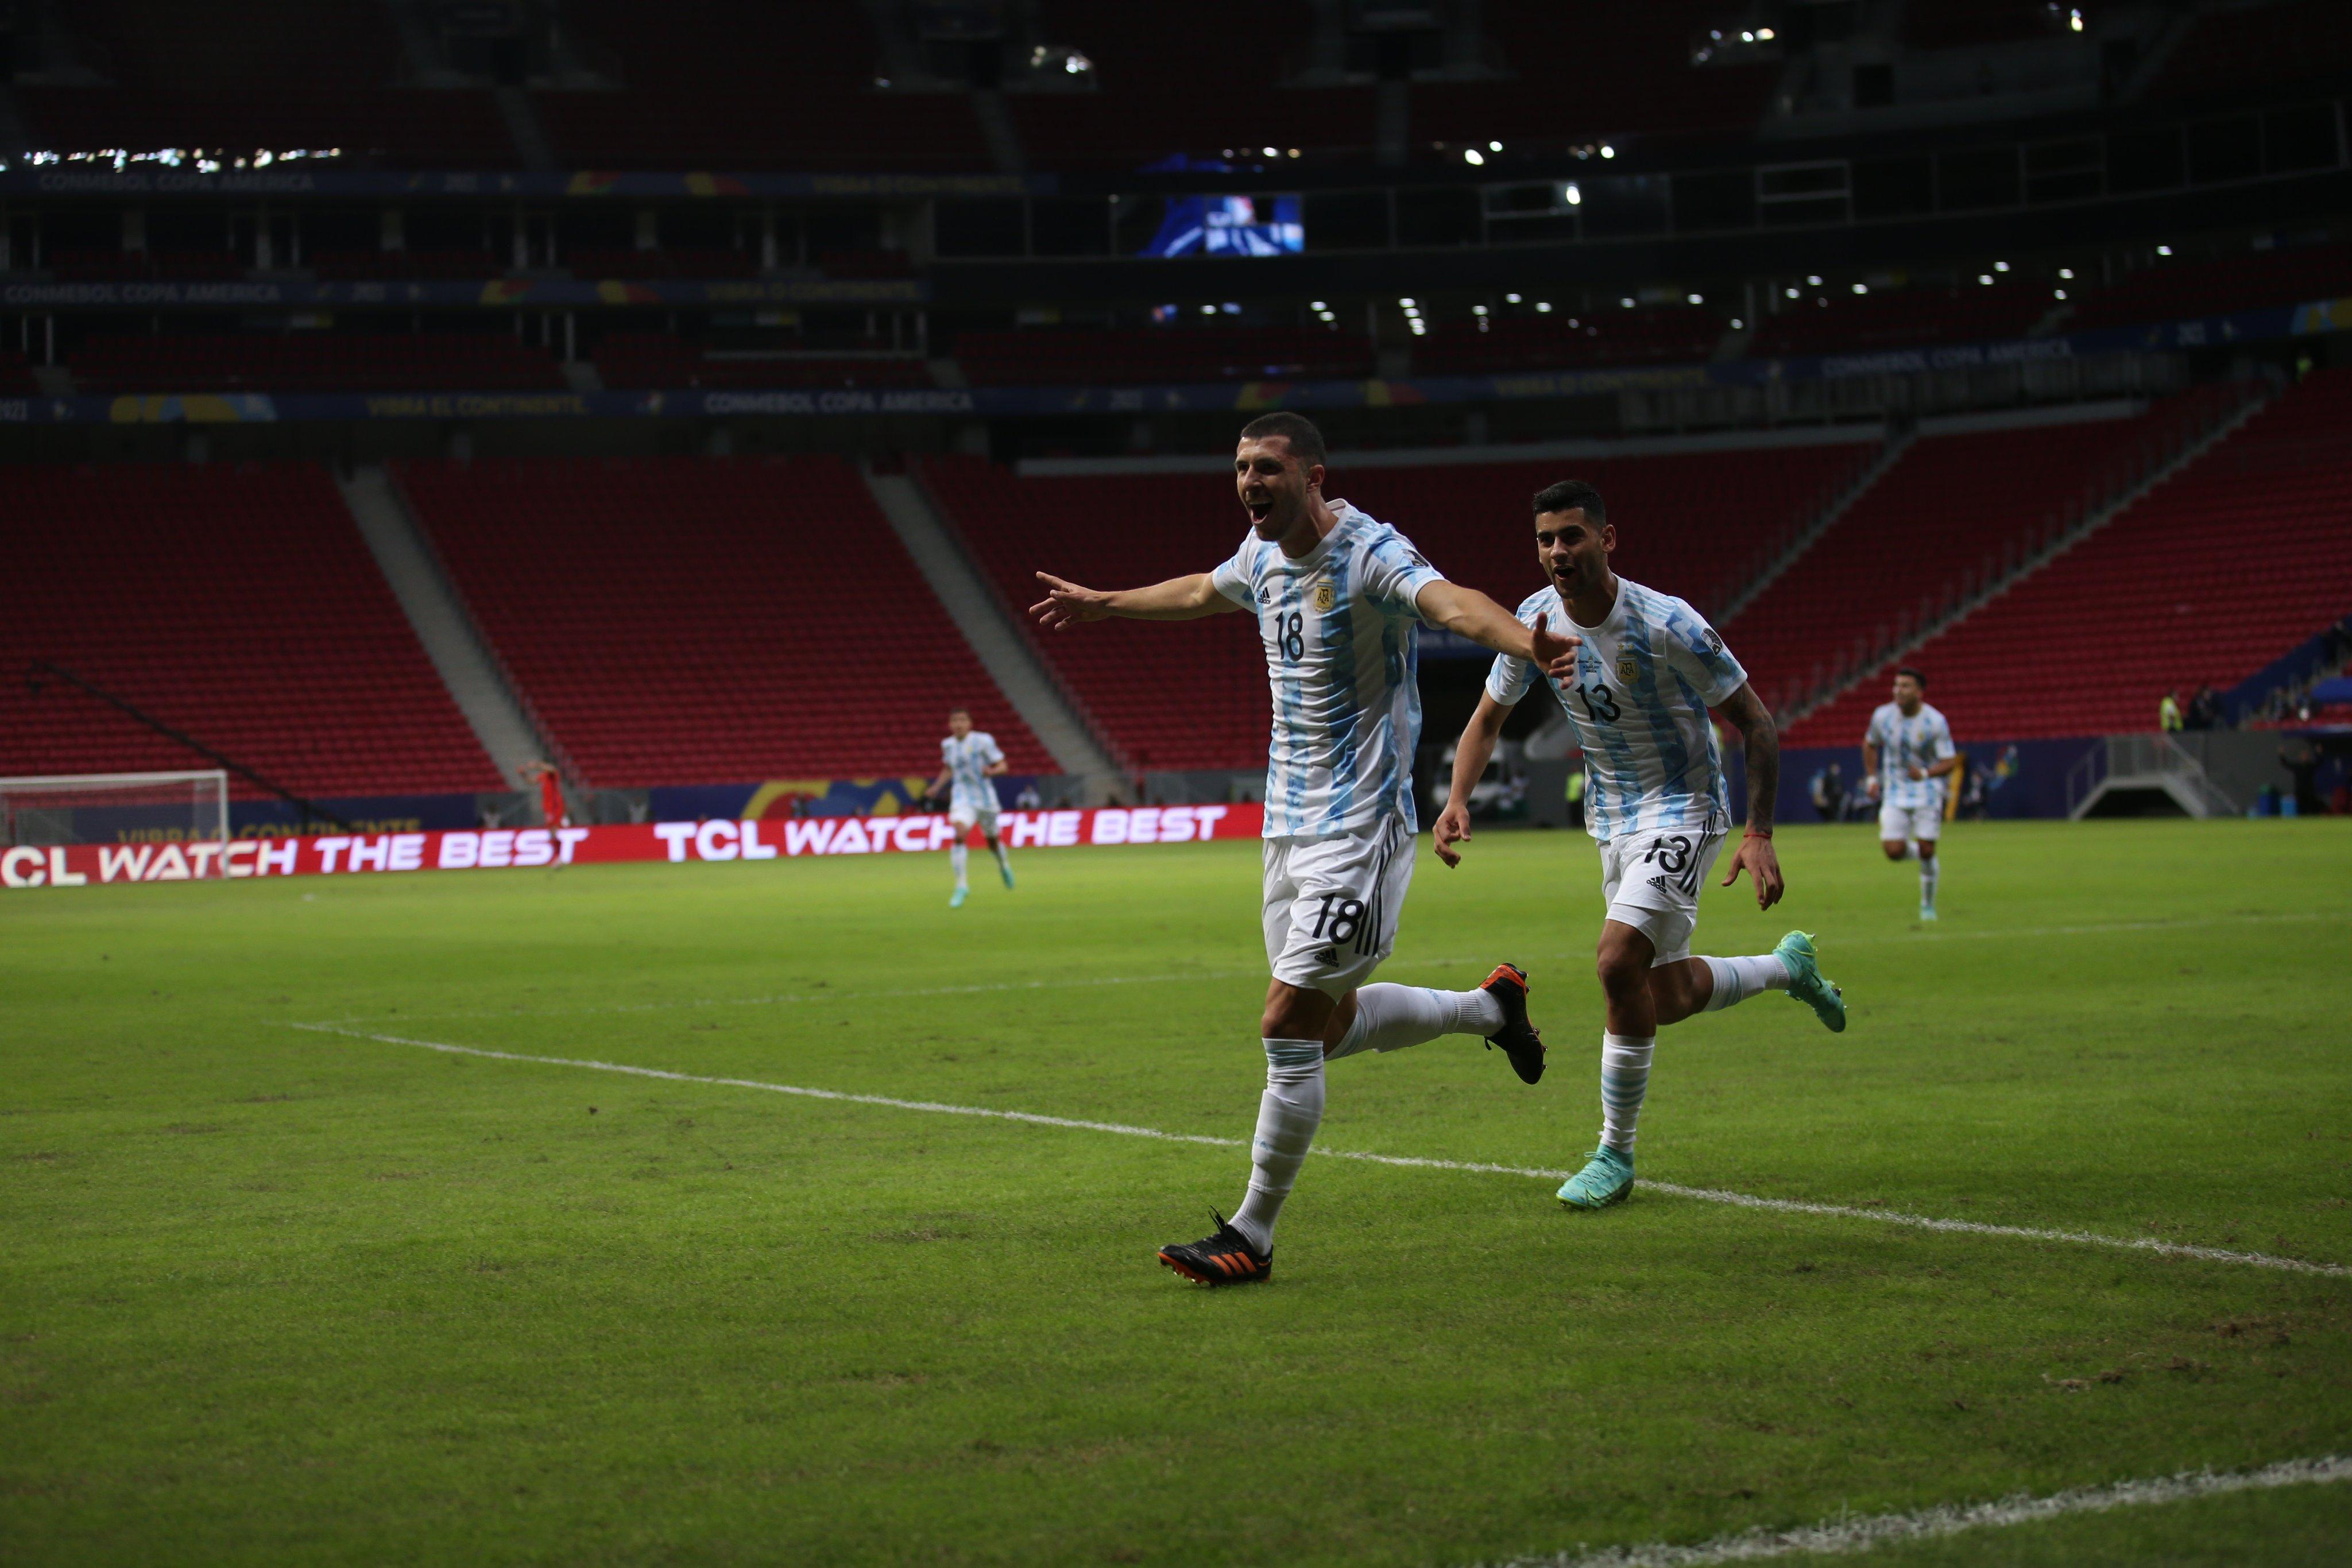 Argentina y Chile líderes de la Copa América. Foto: Twitter